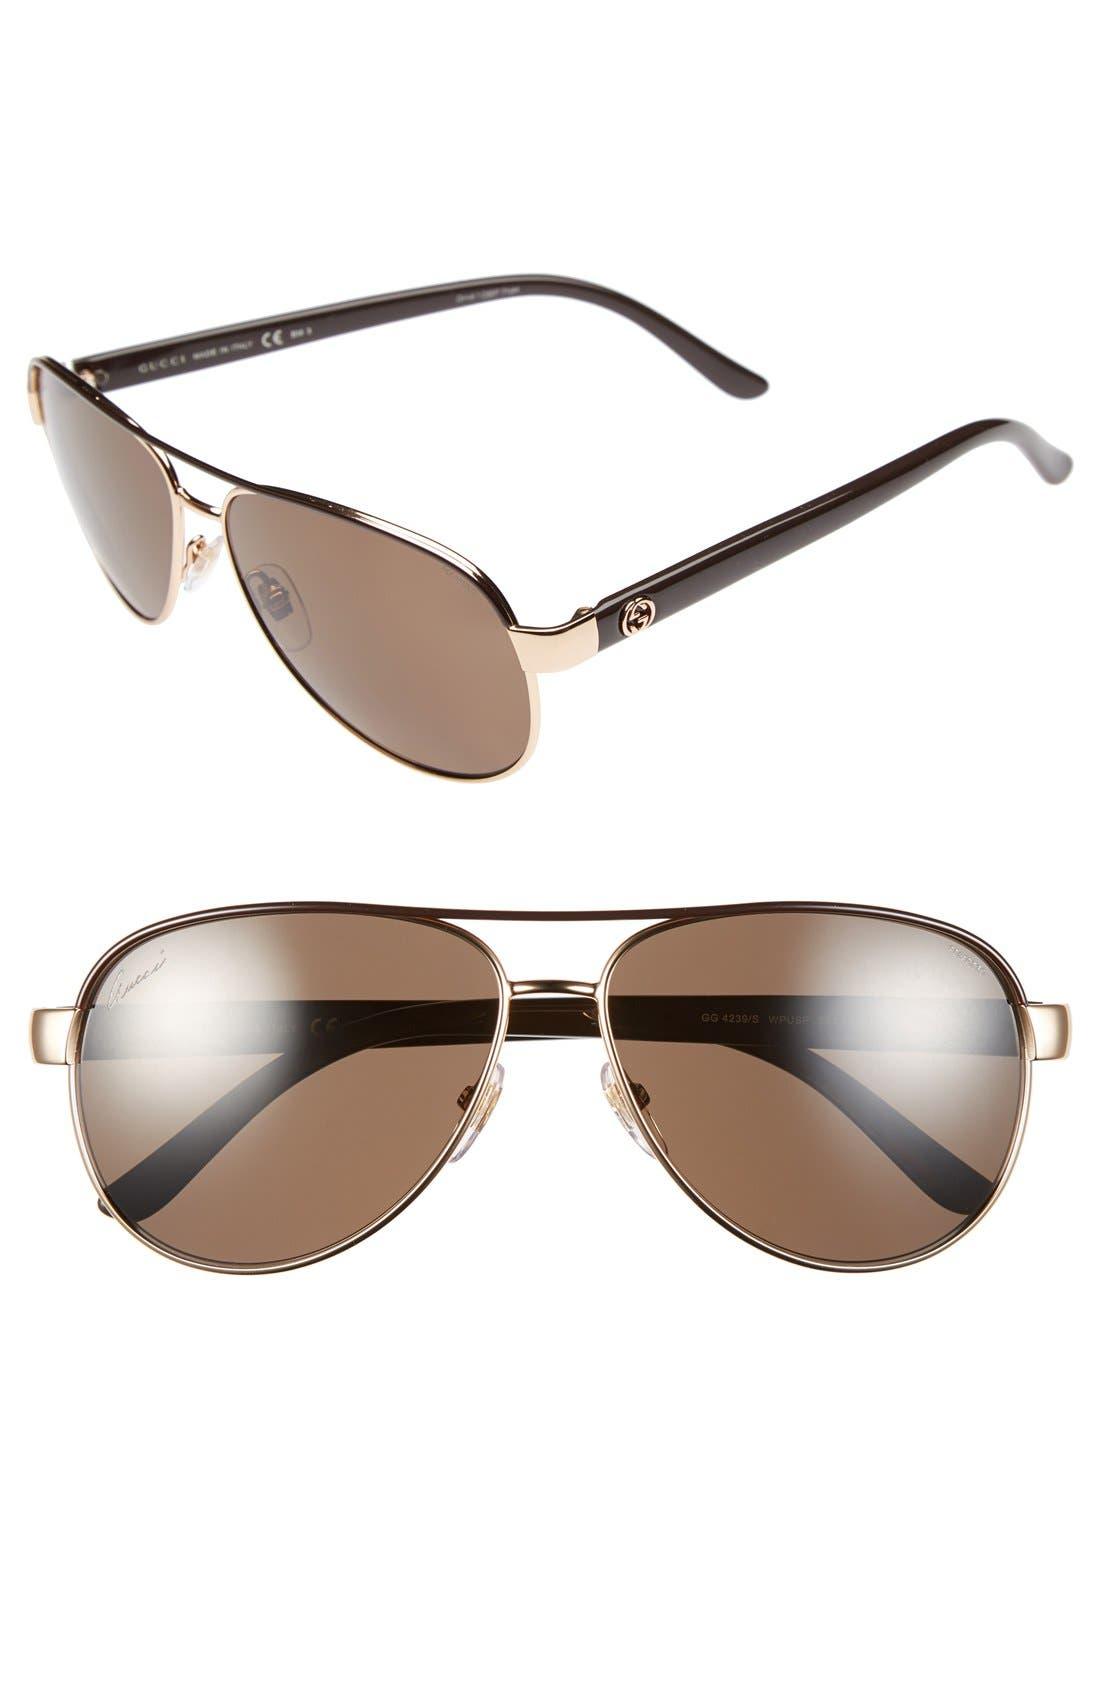 Alternate Image 1 Selected - Gucci 58mm Polarized Aviator Sunglasses